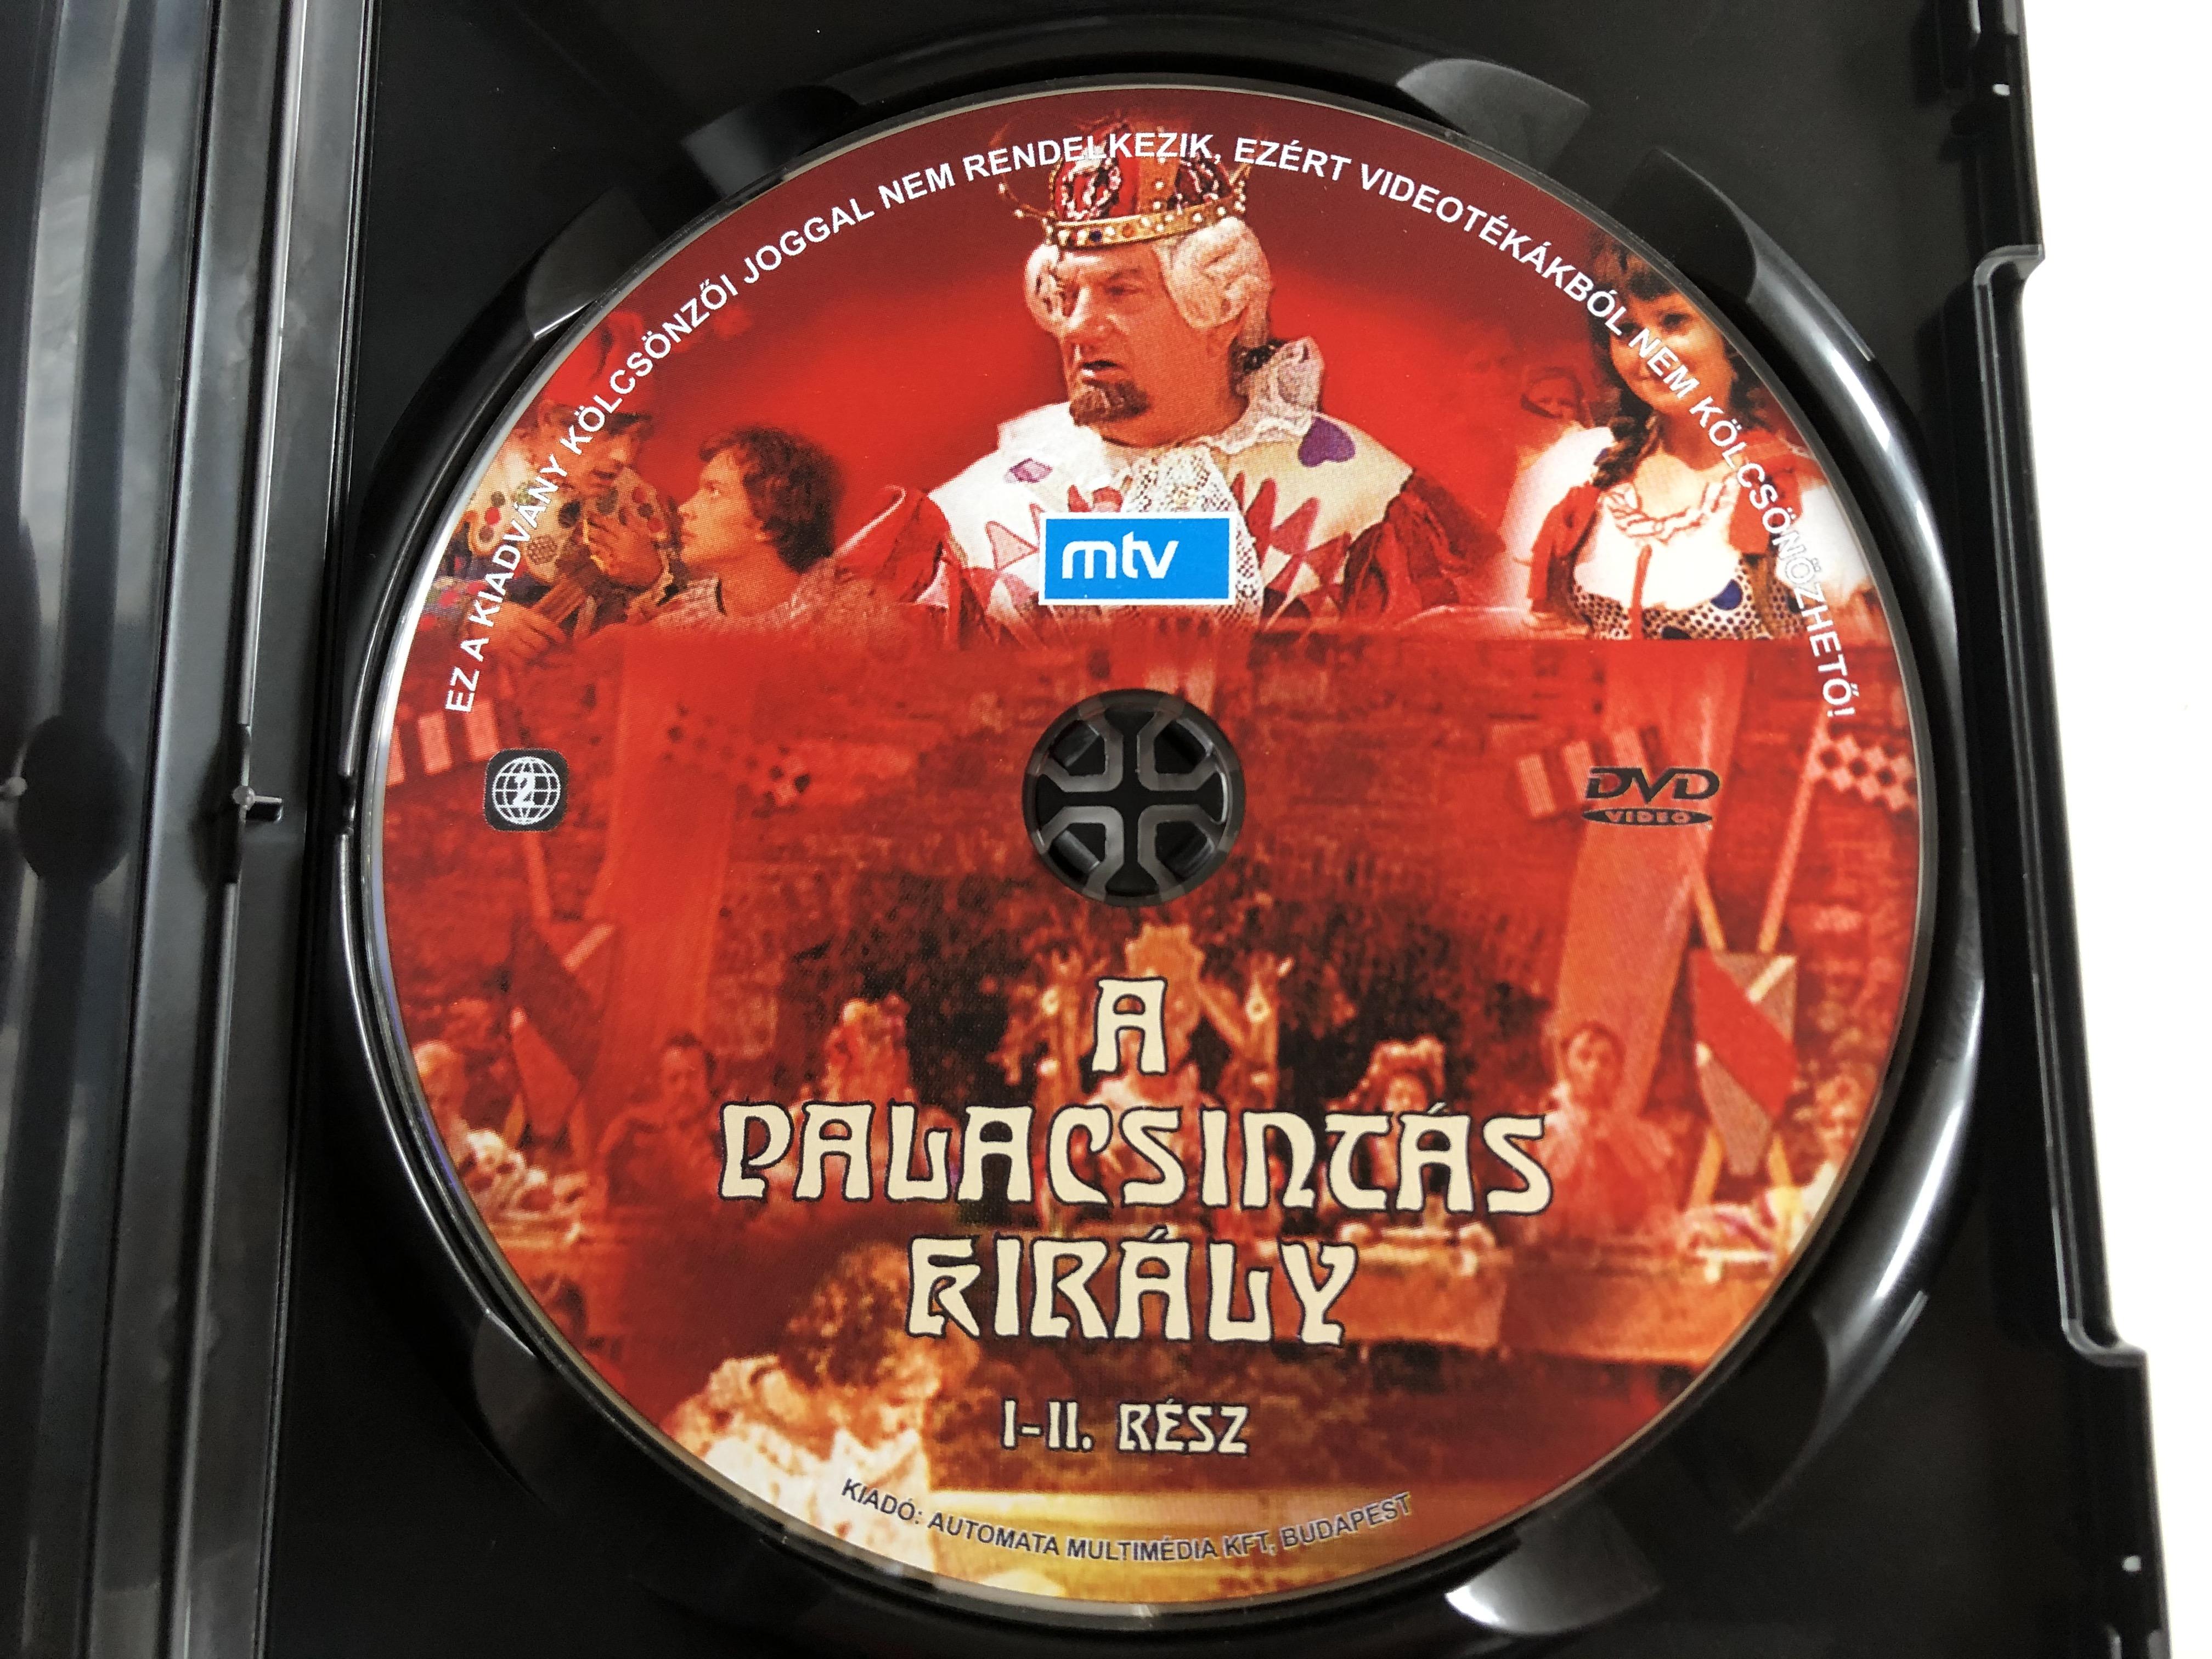 a-palacsint-s-kir-ly-i-ii.-dvd-1973-the-pancake-king-i-ii.-2.jpg